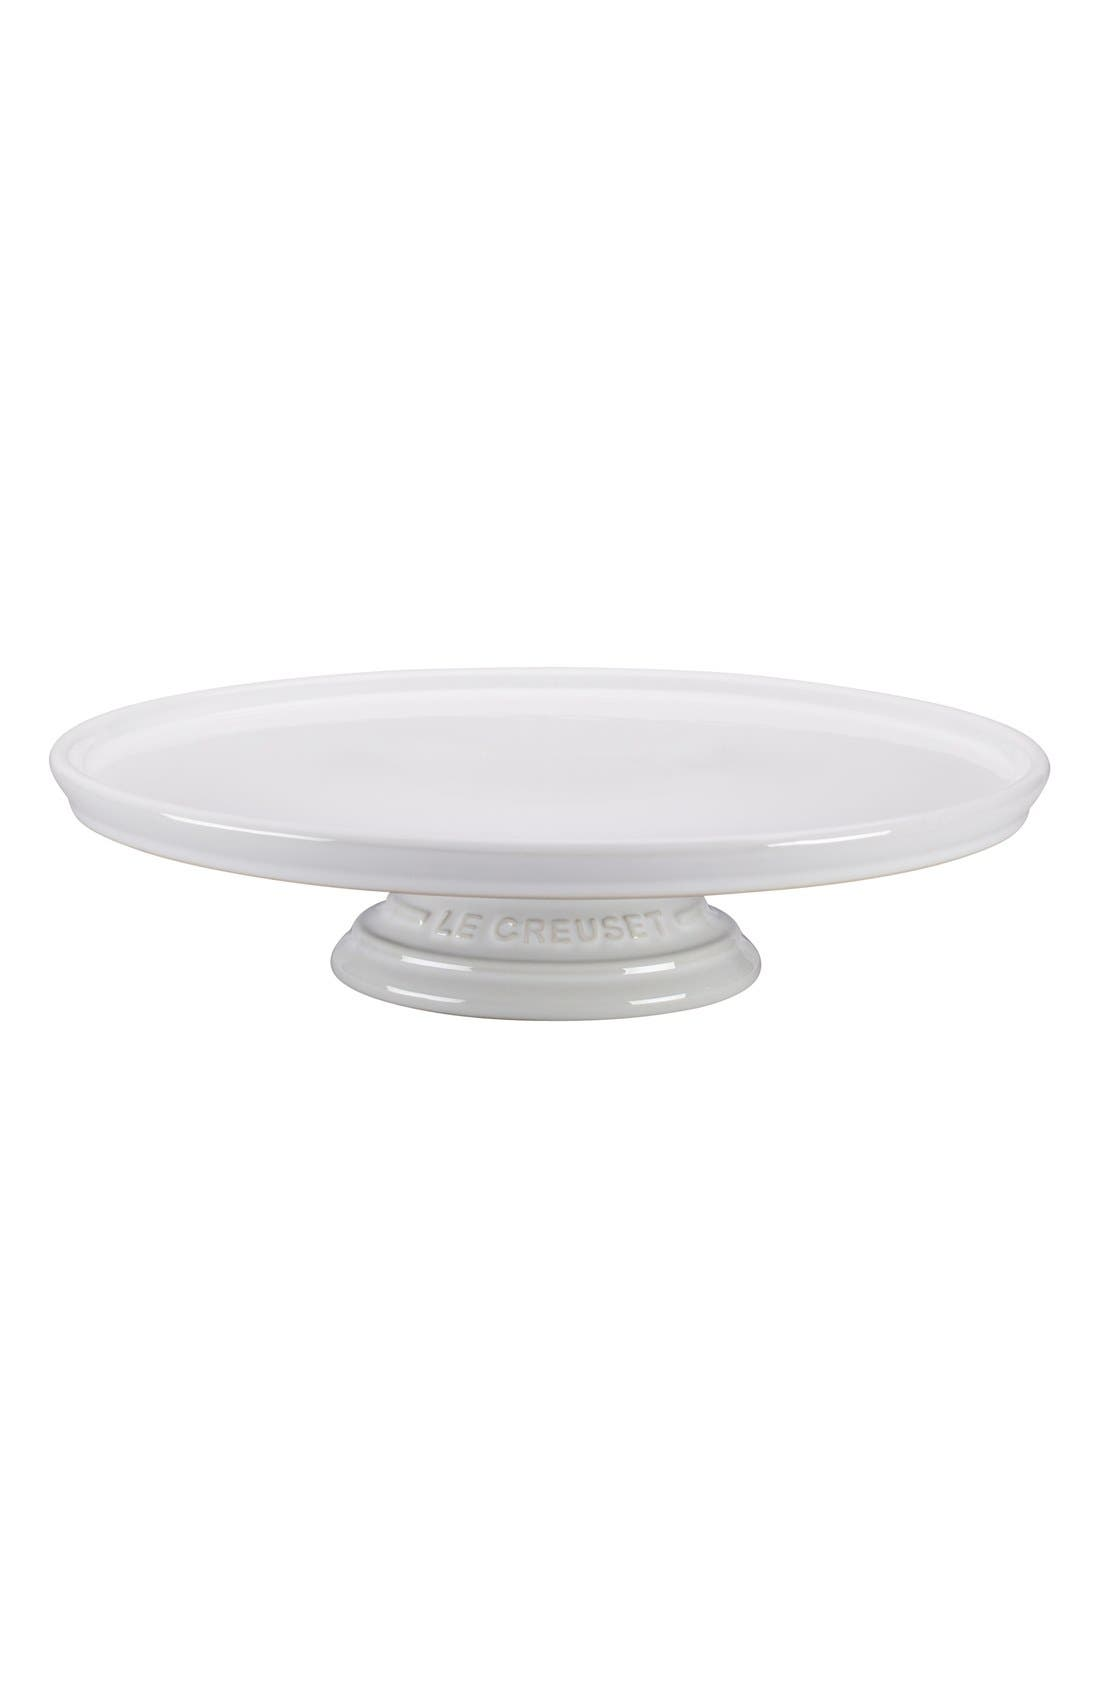 Main Image - Le Creuset Stoneware Cake Stand